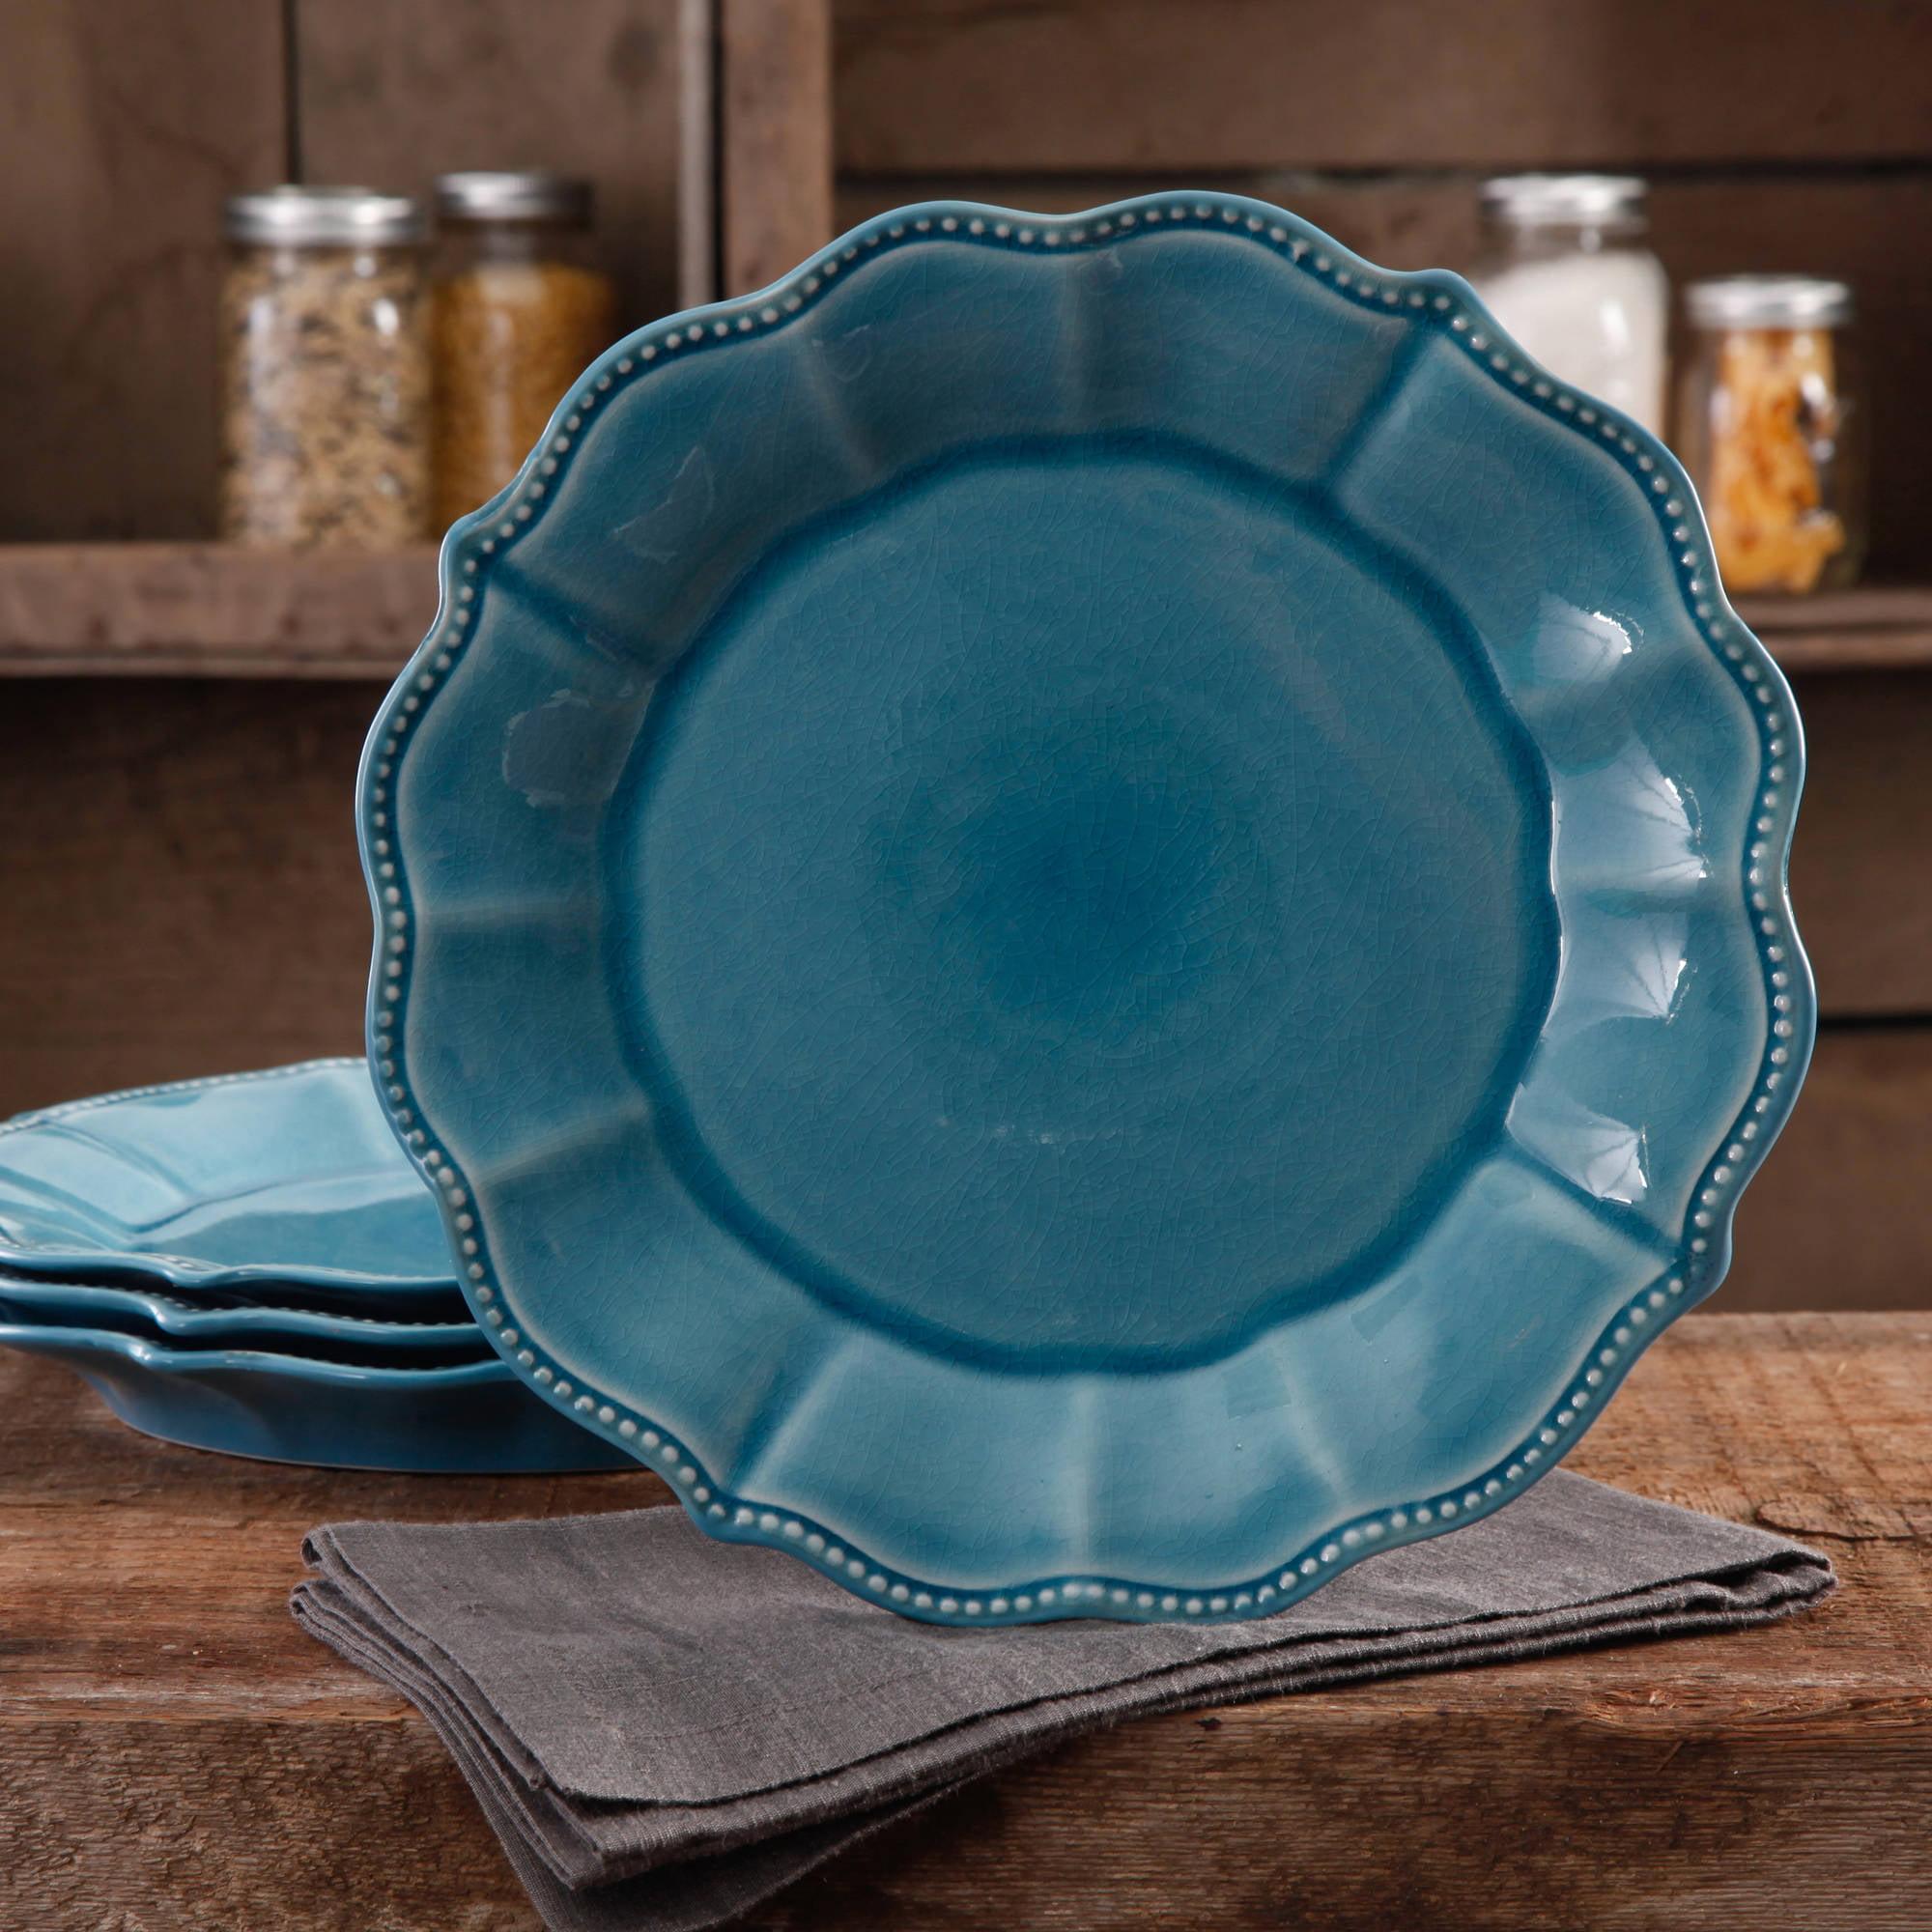 & The Pioneer Woman Paige Crackle Glaze 4-Pack Dinner Plates - Walmart.com